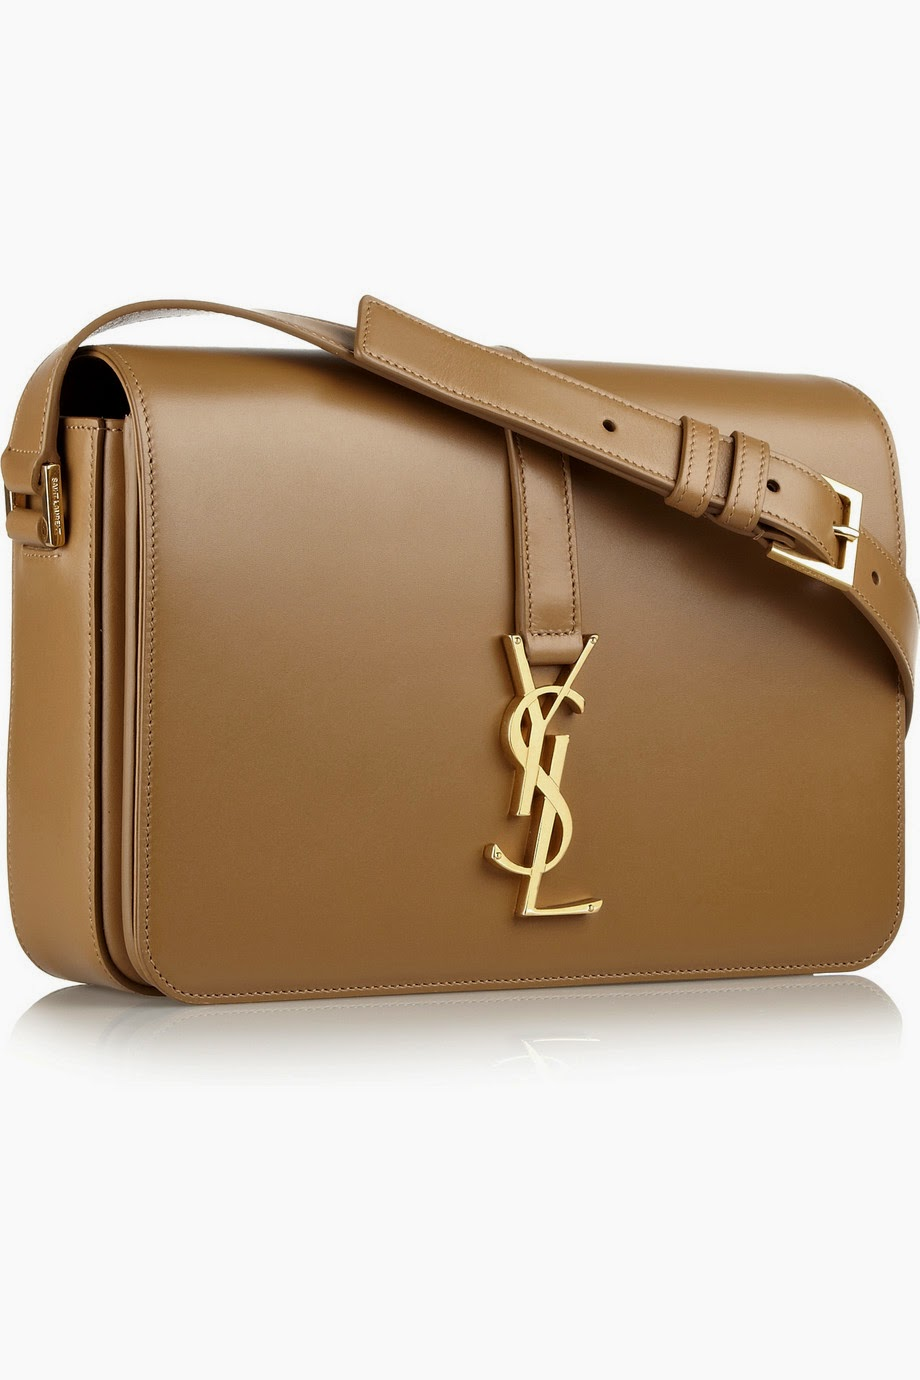 ysl wallet mens - YVES SAINT LAURENT Monogramme Sac Universit�� leather shoulder bag ...